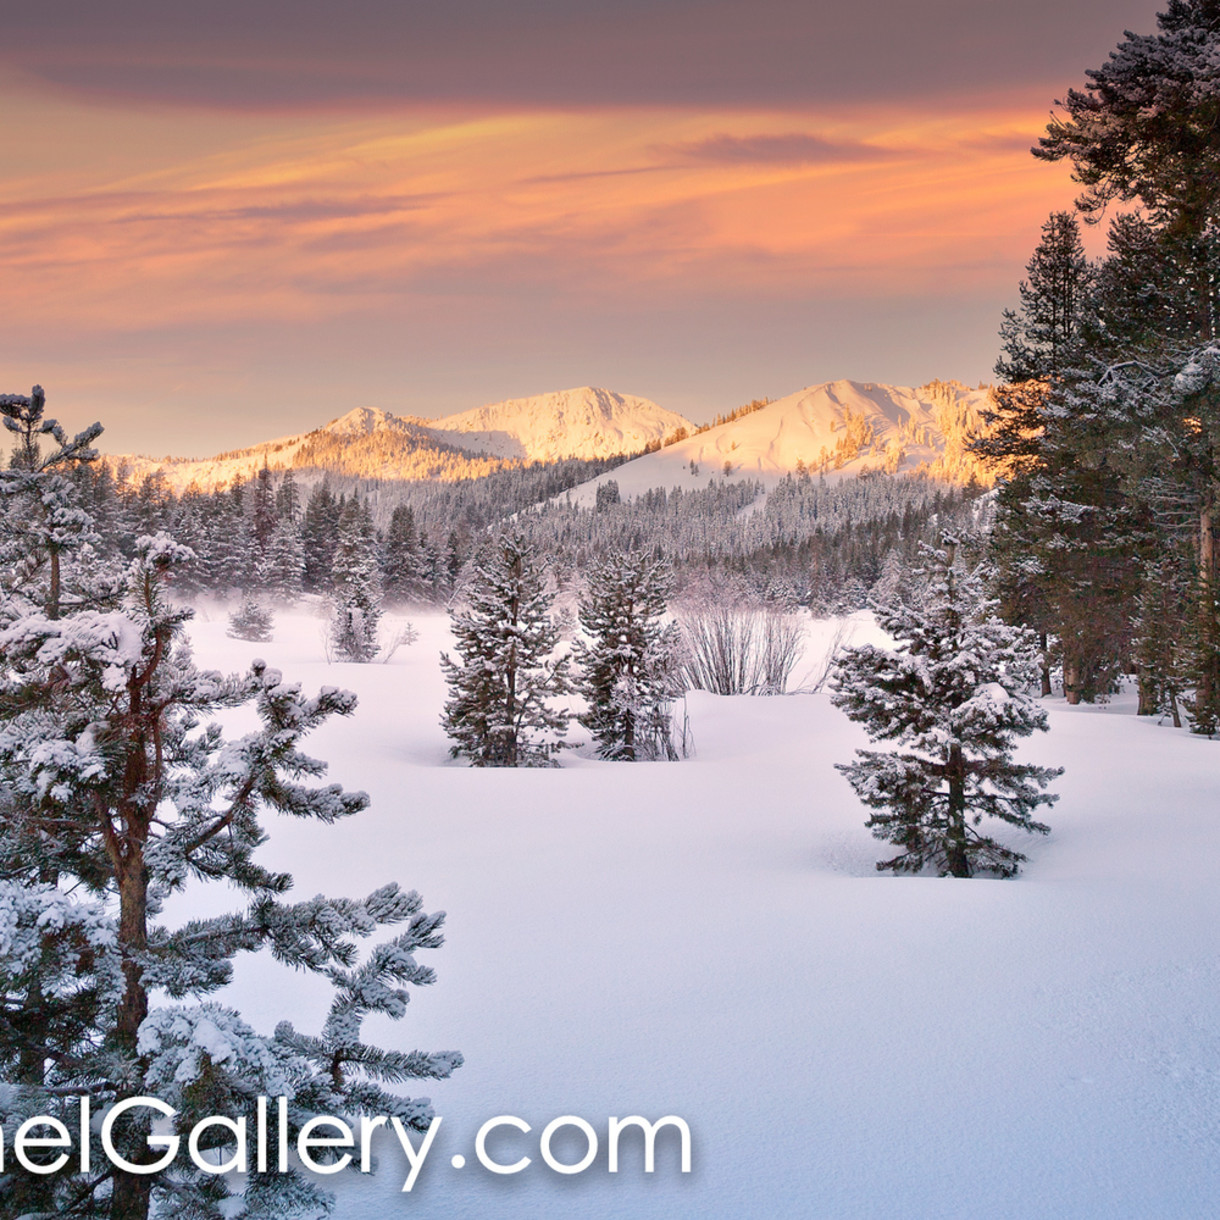 Euer valley winter view xlh60q